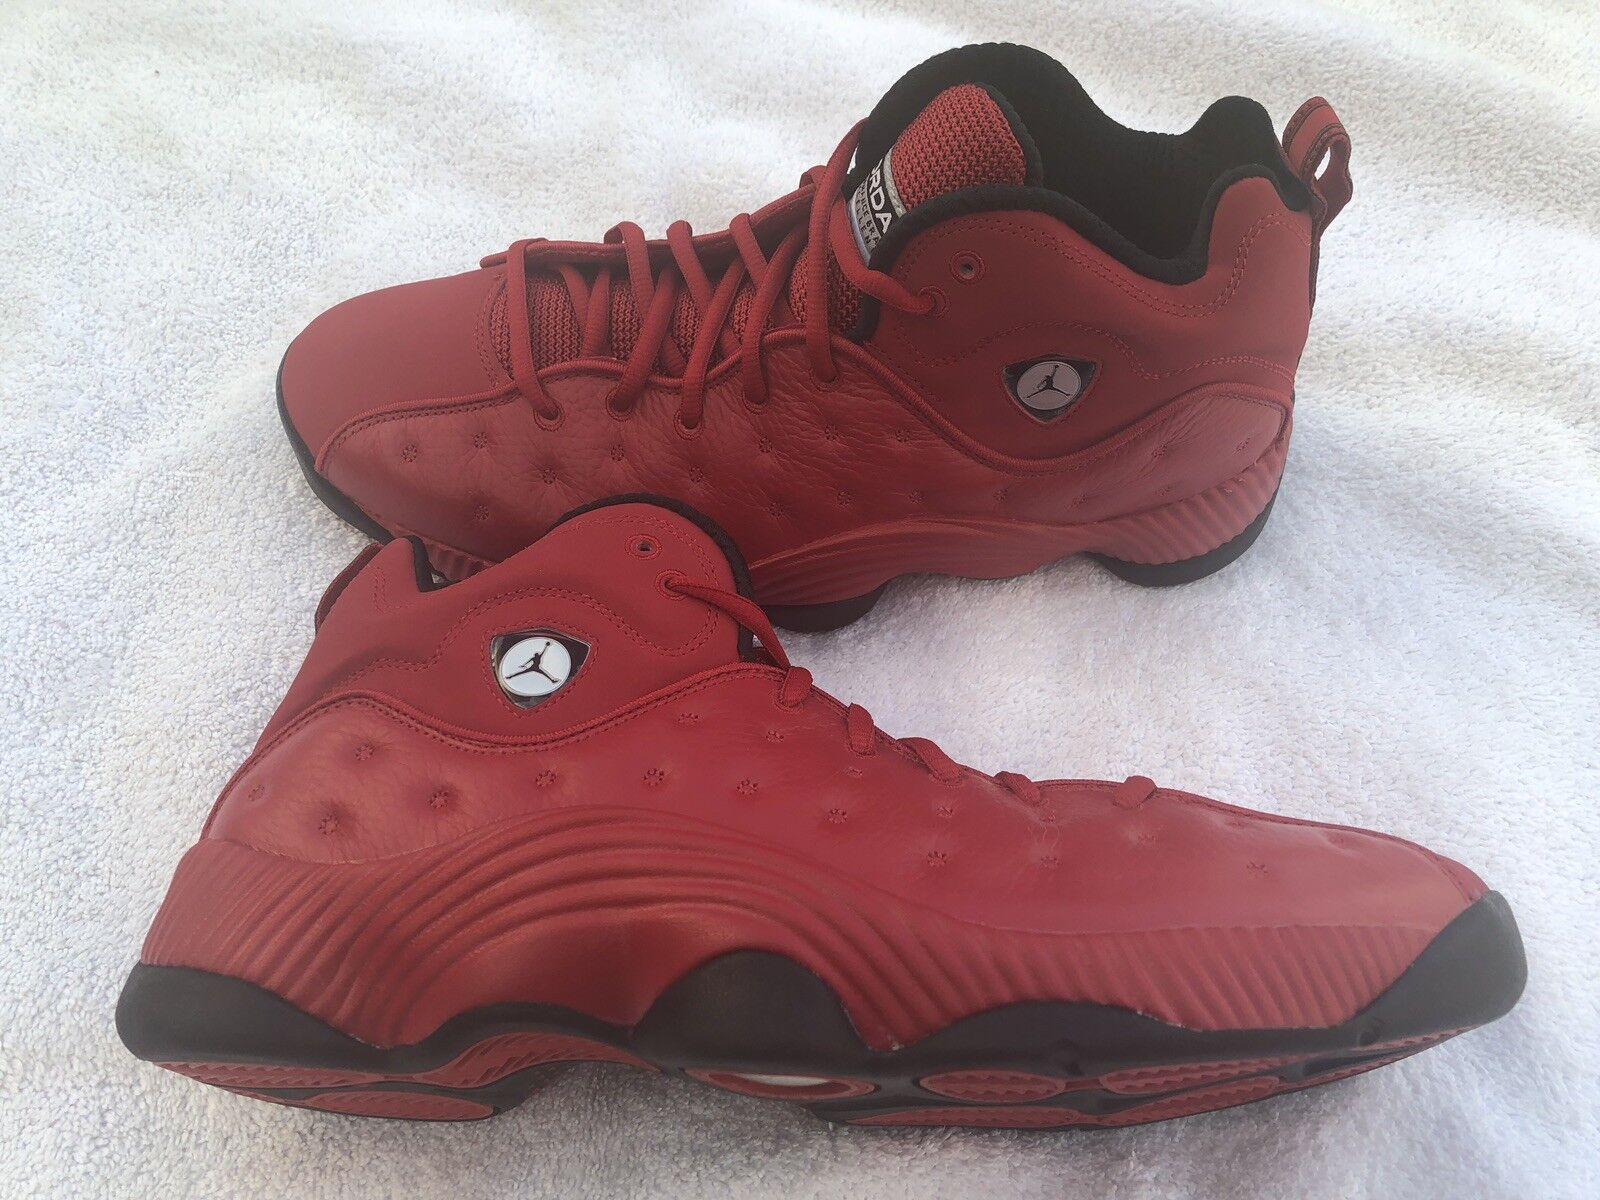 Nike Mens Air Jordan Jumpman Team II Sneakers Gym Red 819175-602 Size 12.0